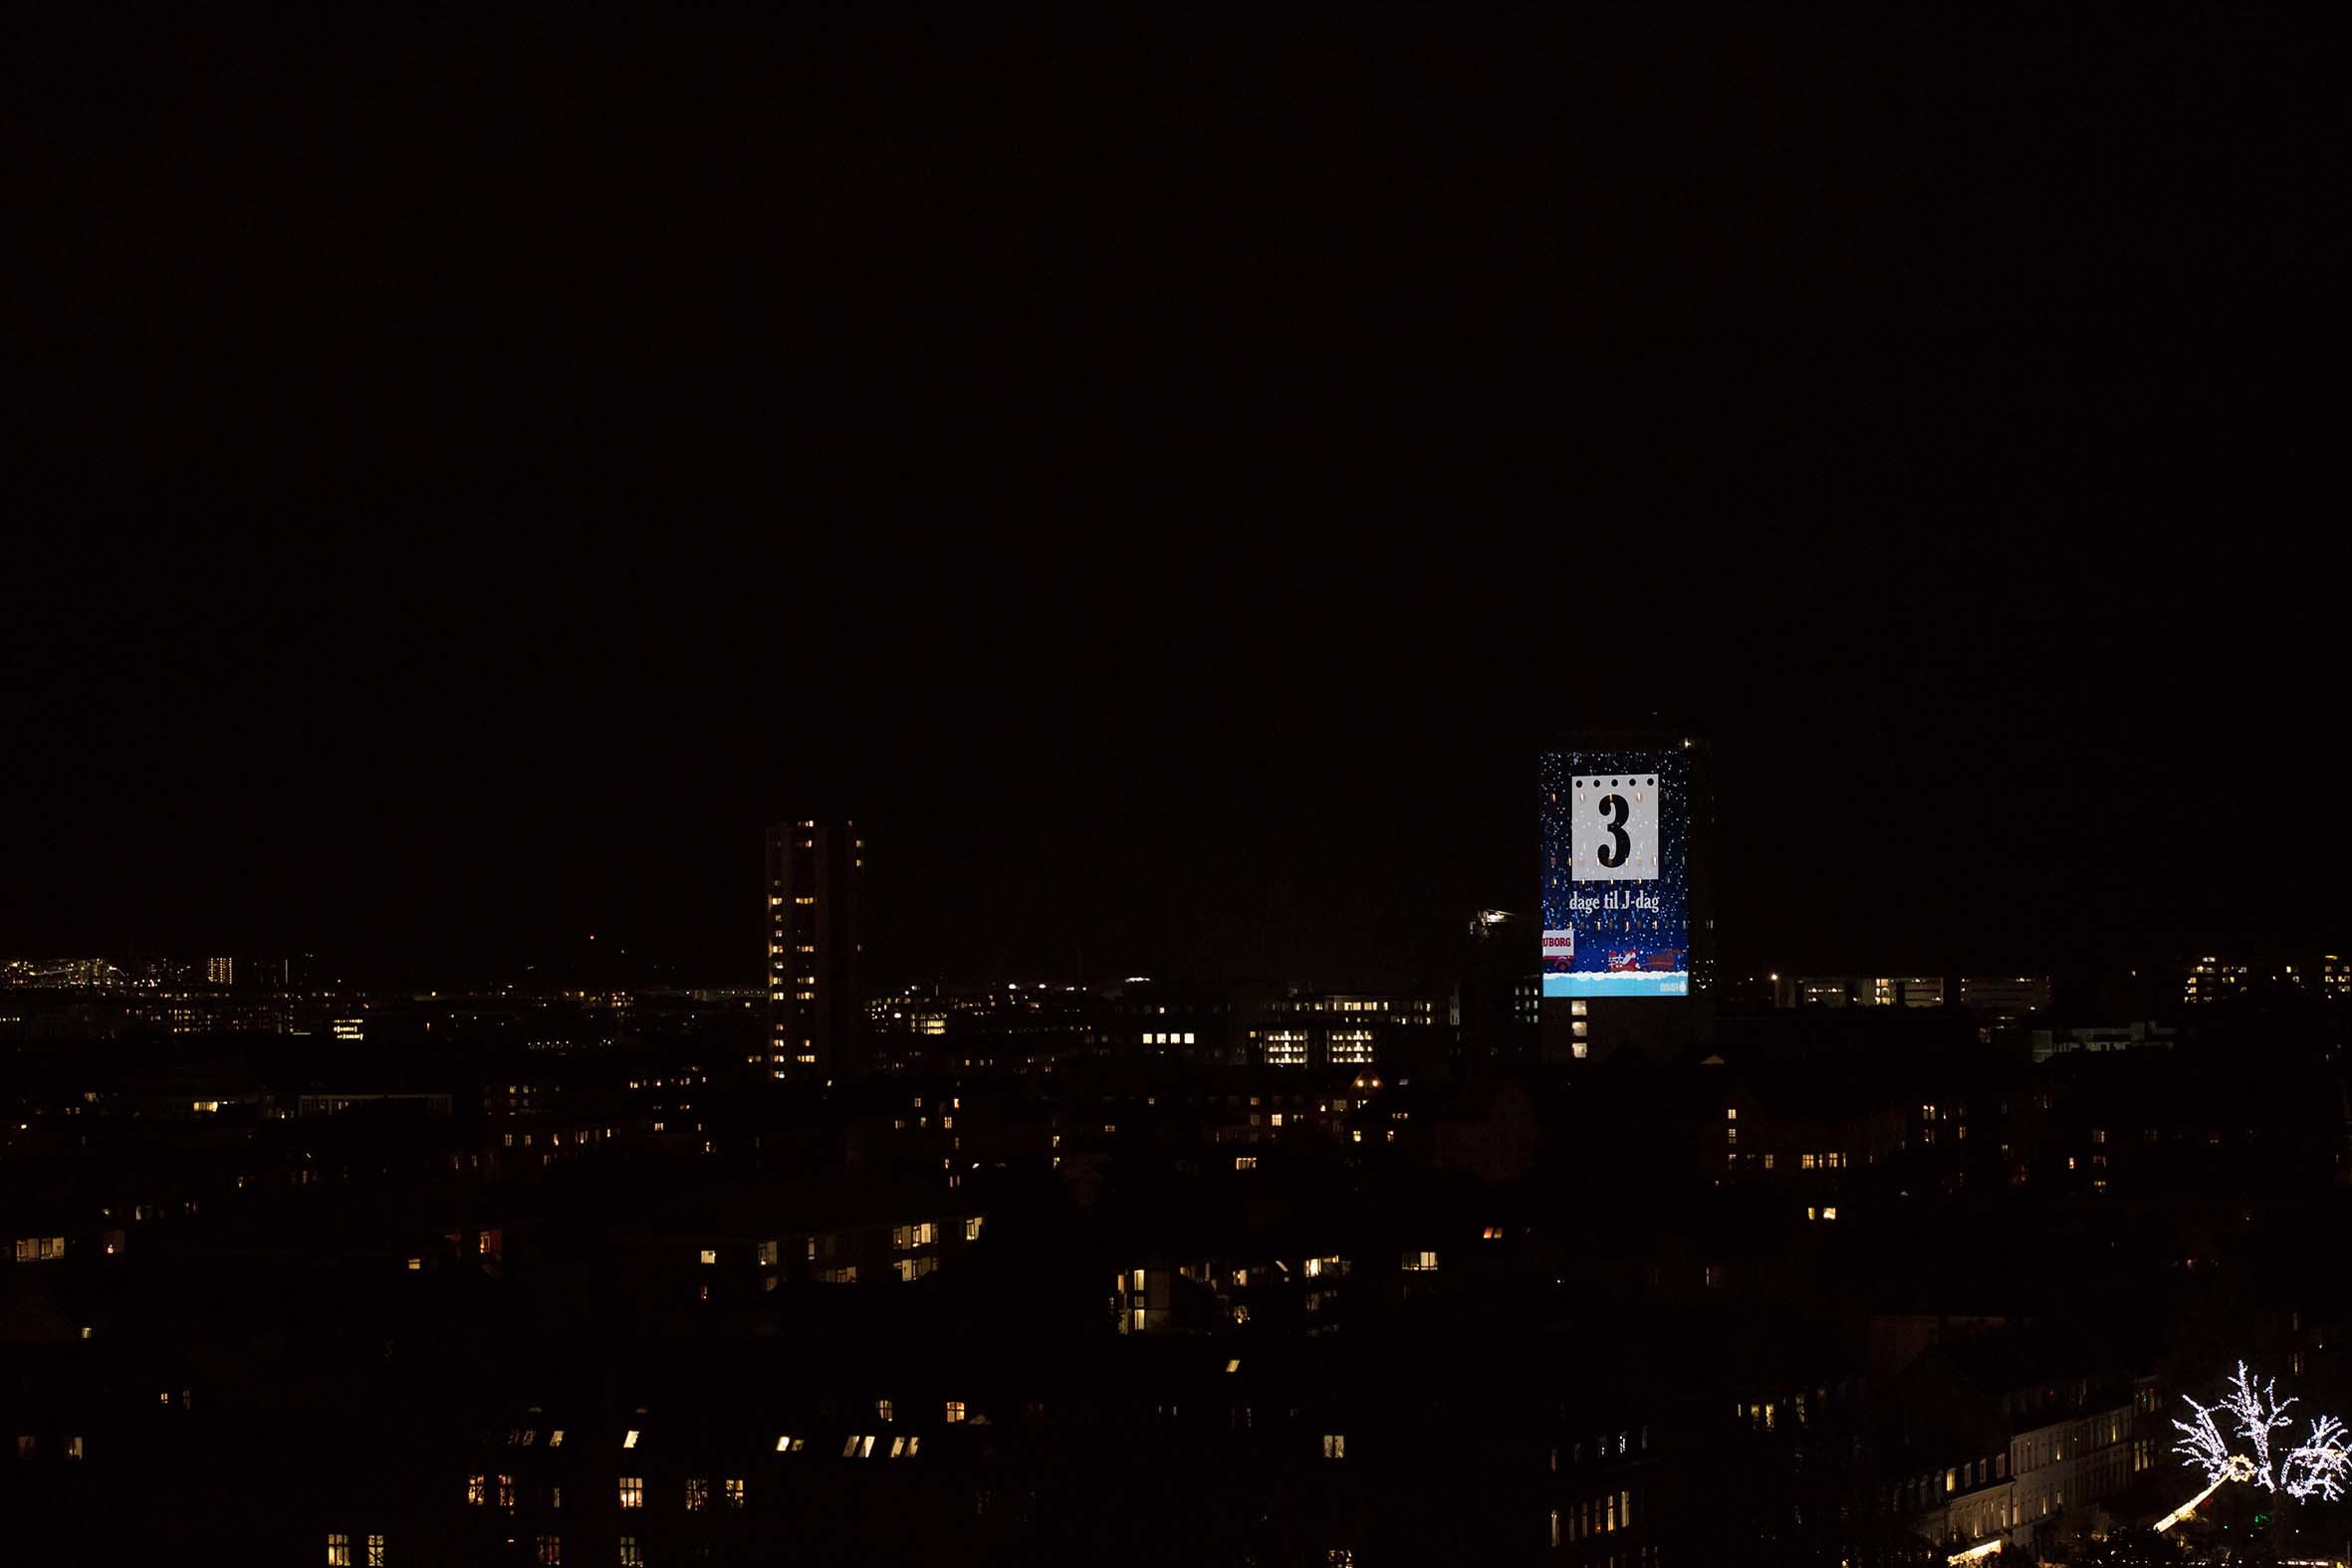 Olivers redigering panorama v2.jpg